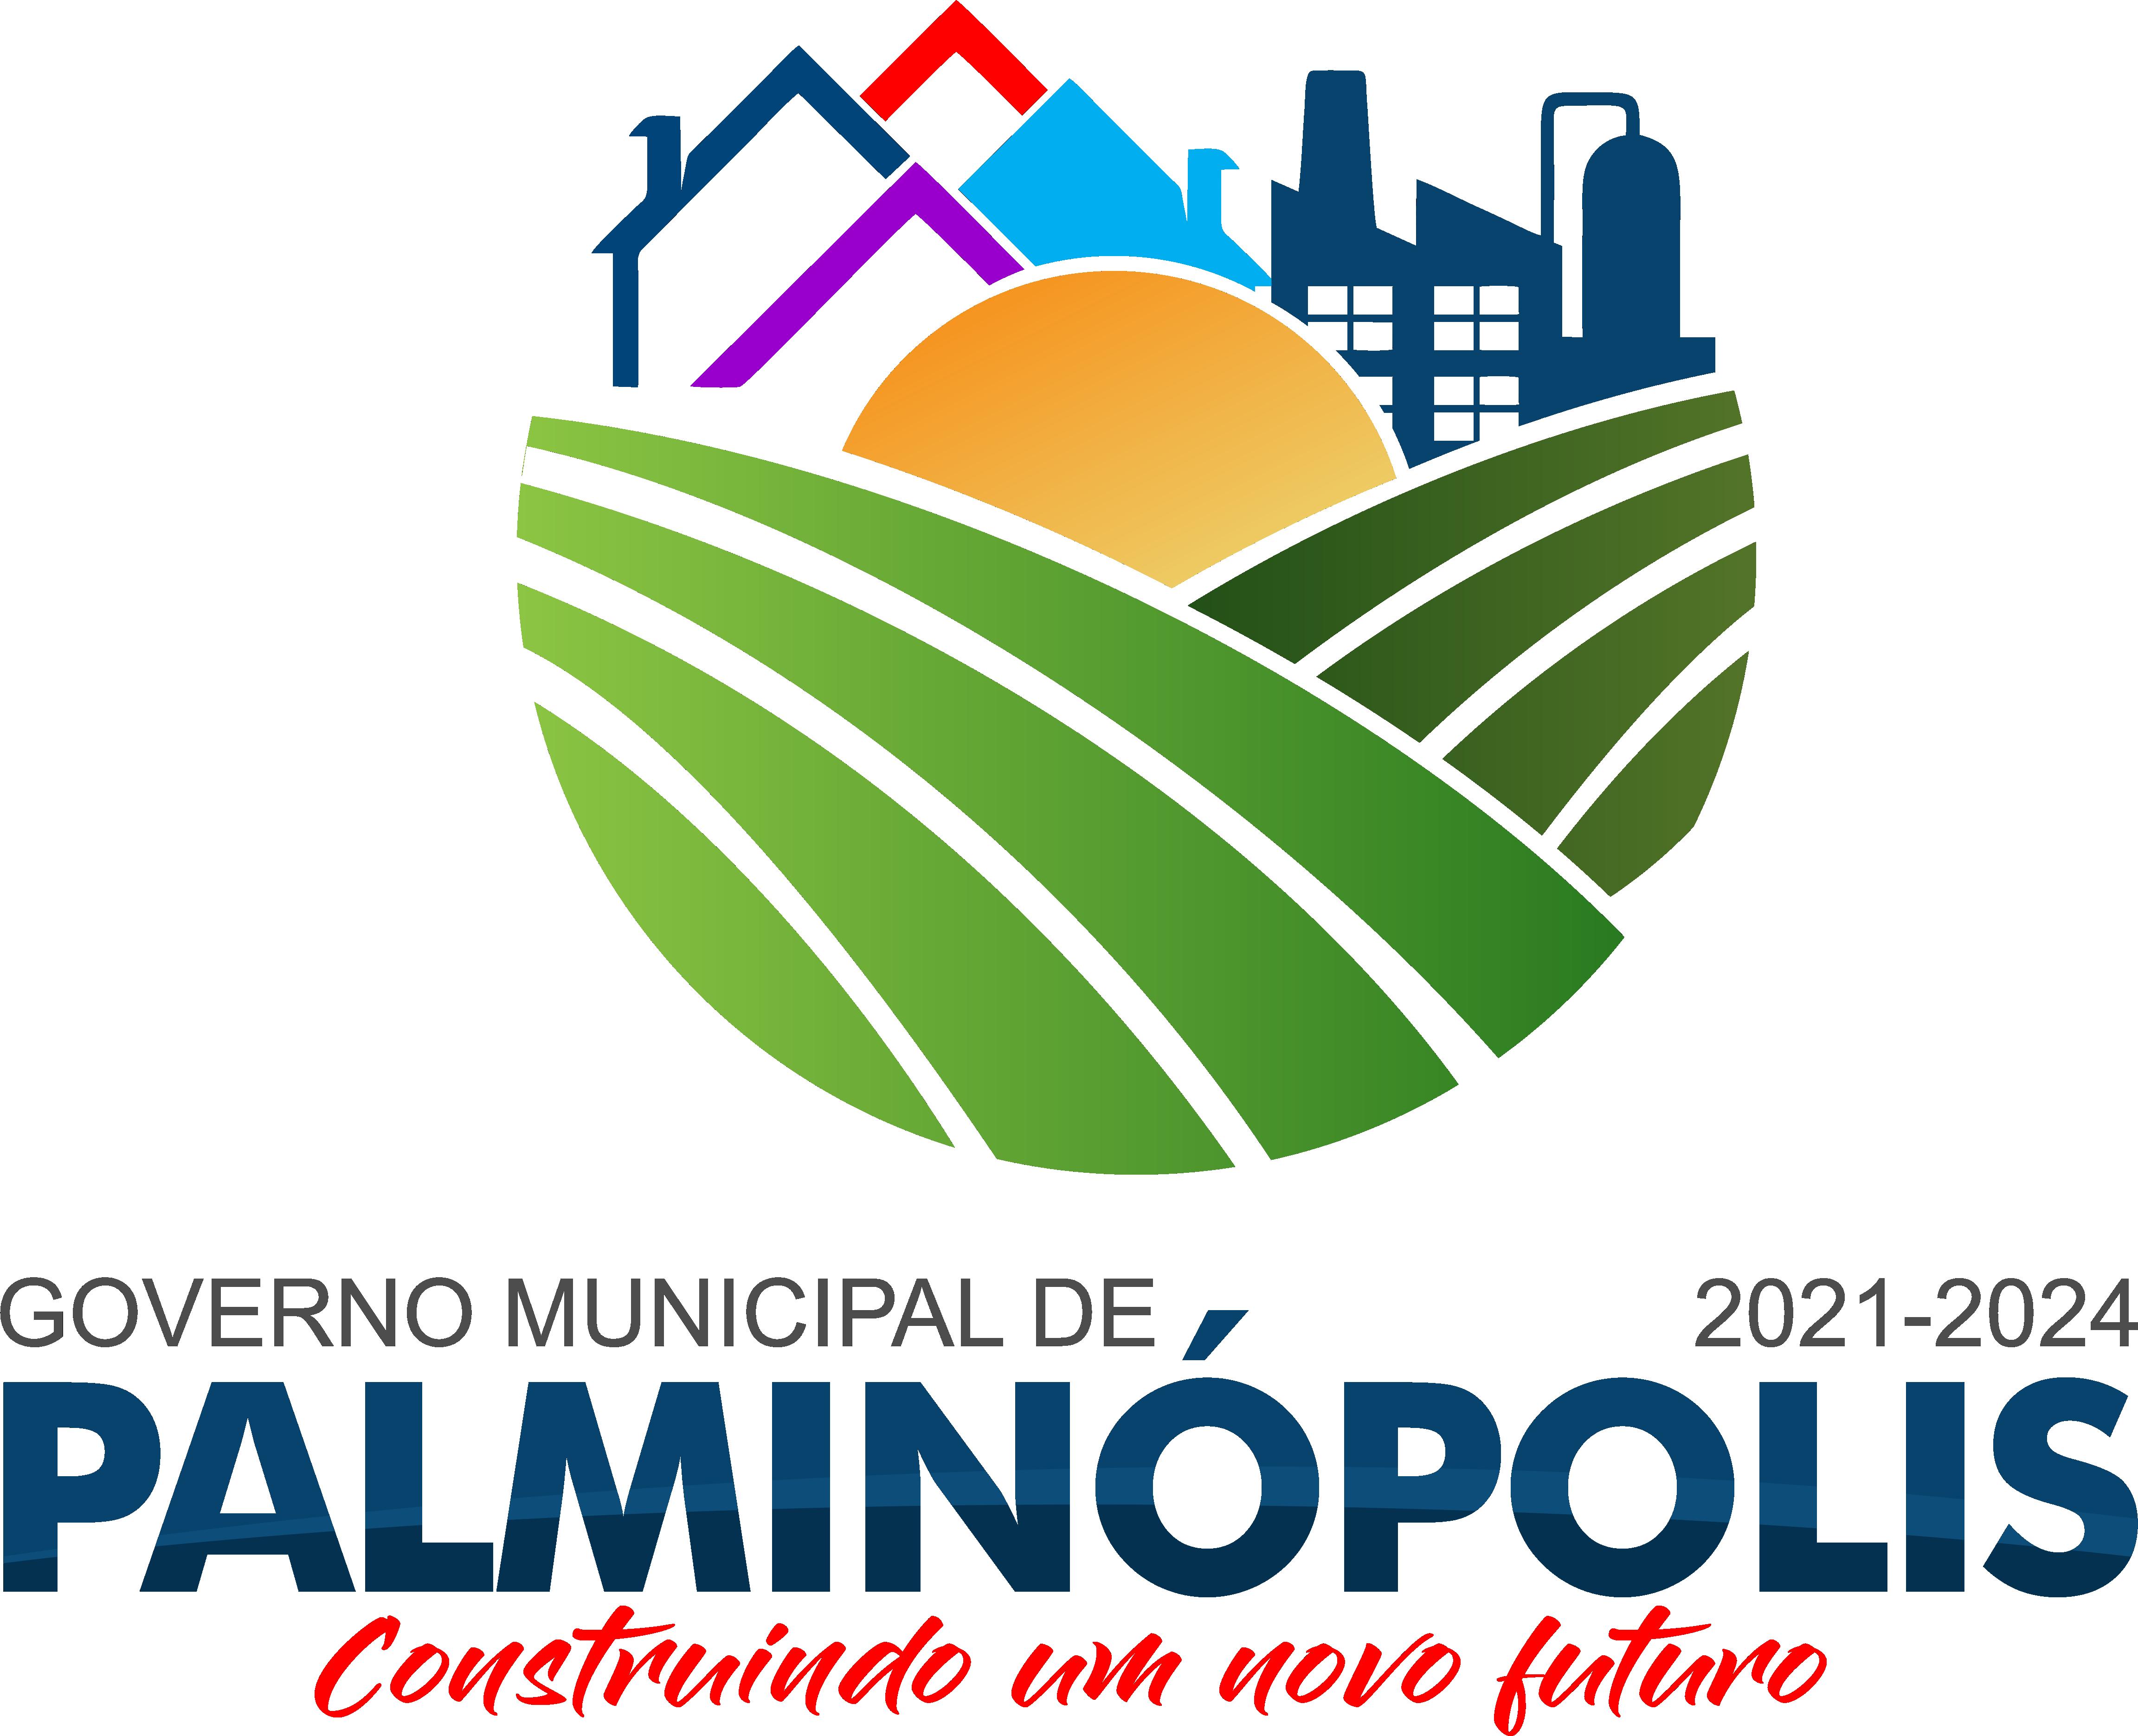 Prefeitura Municipal de Palminopolis